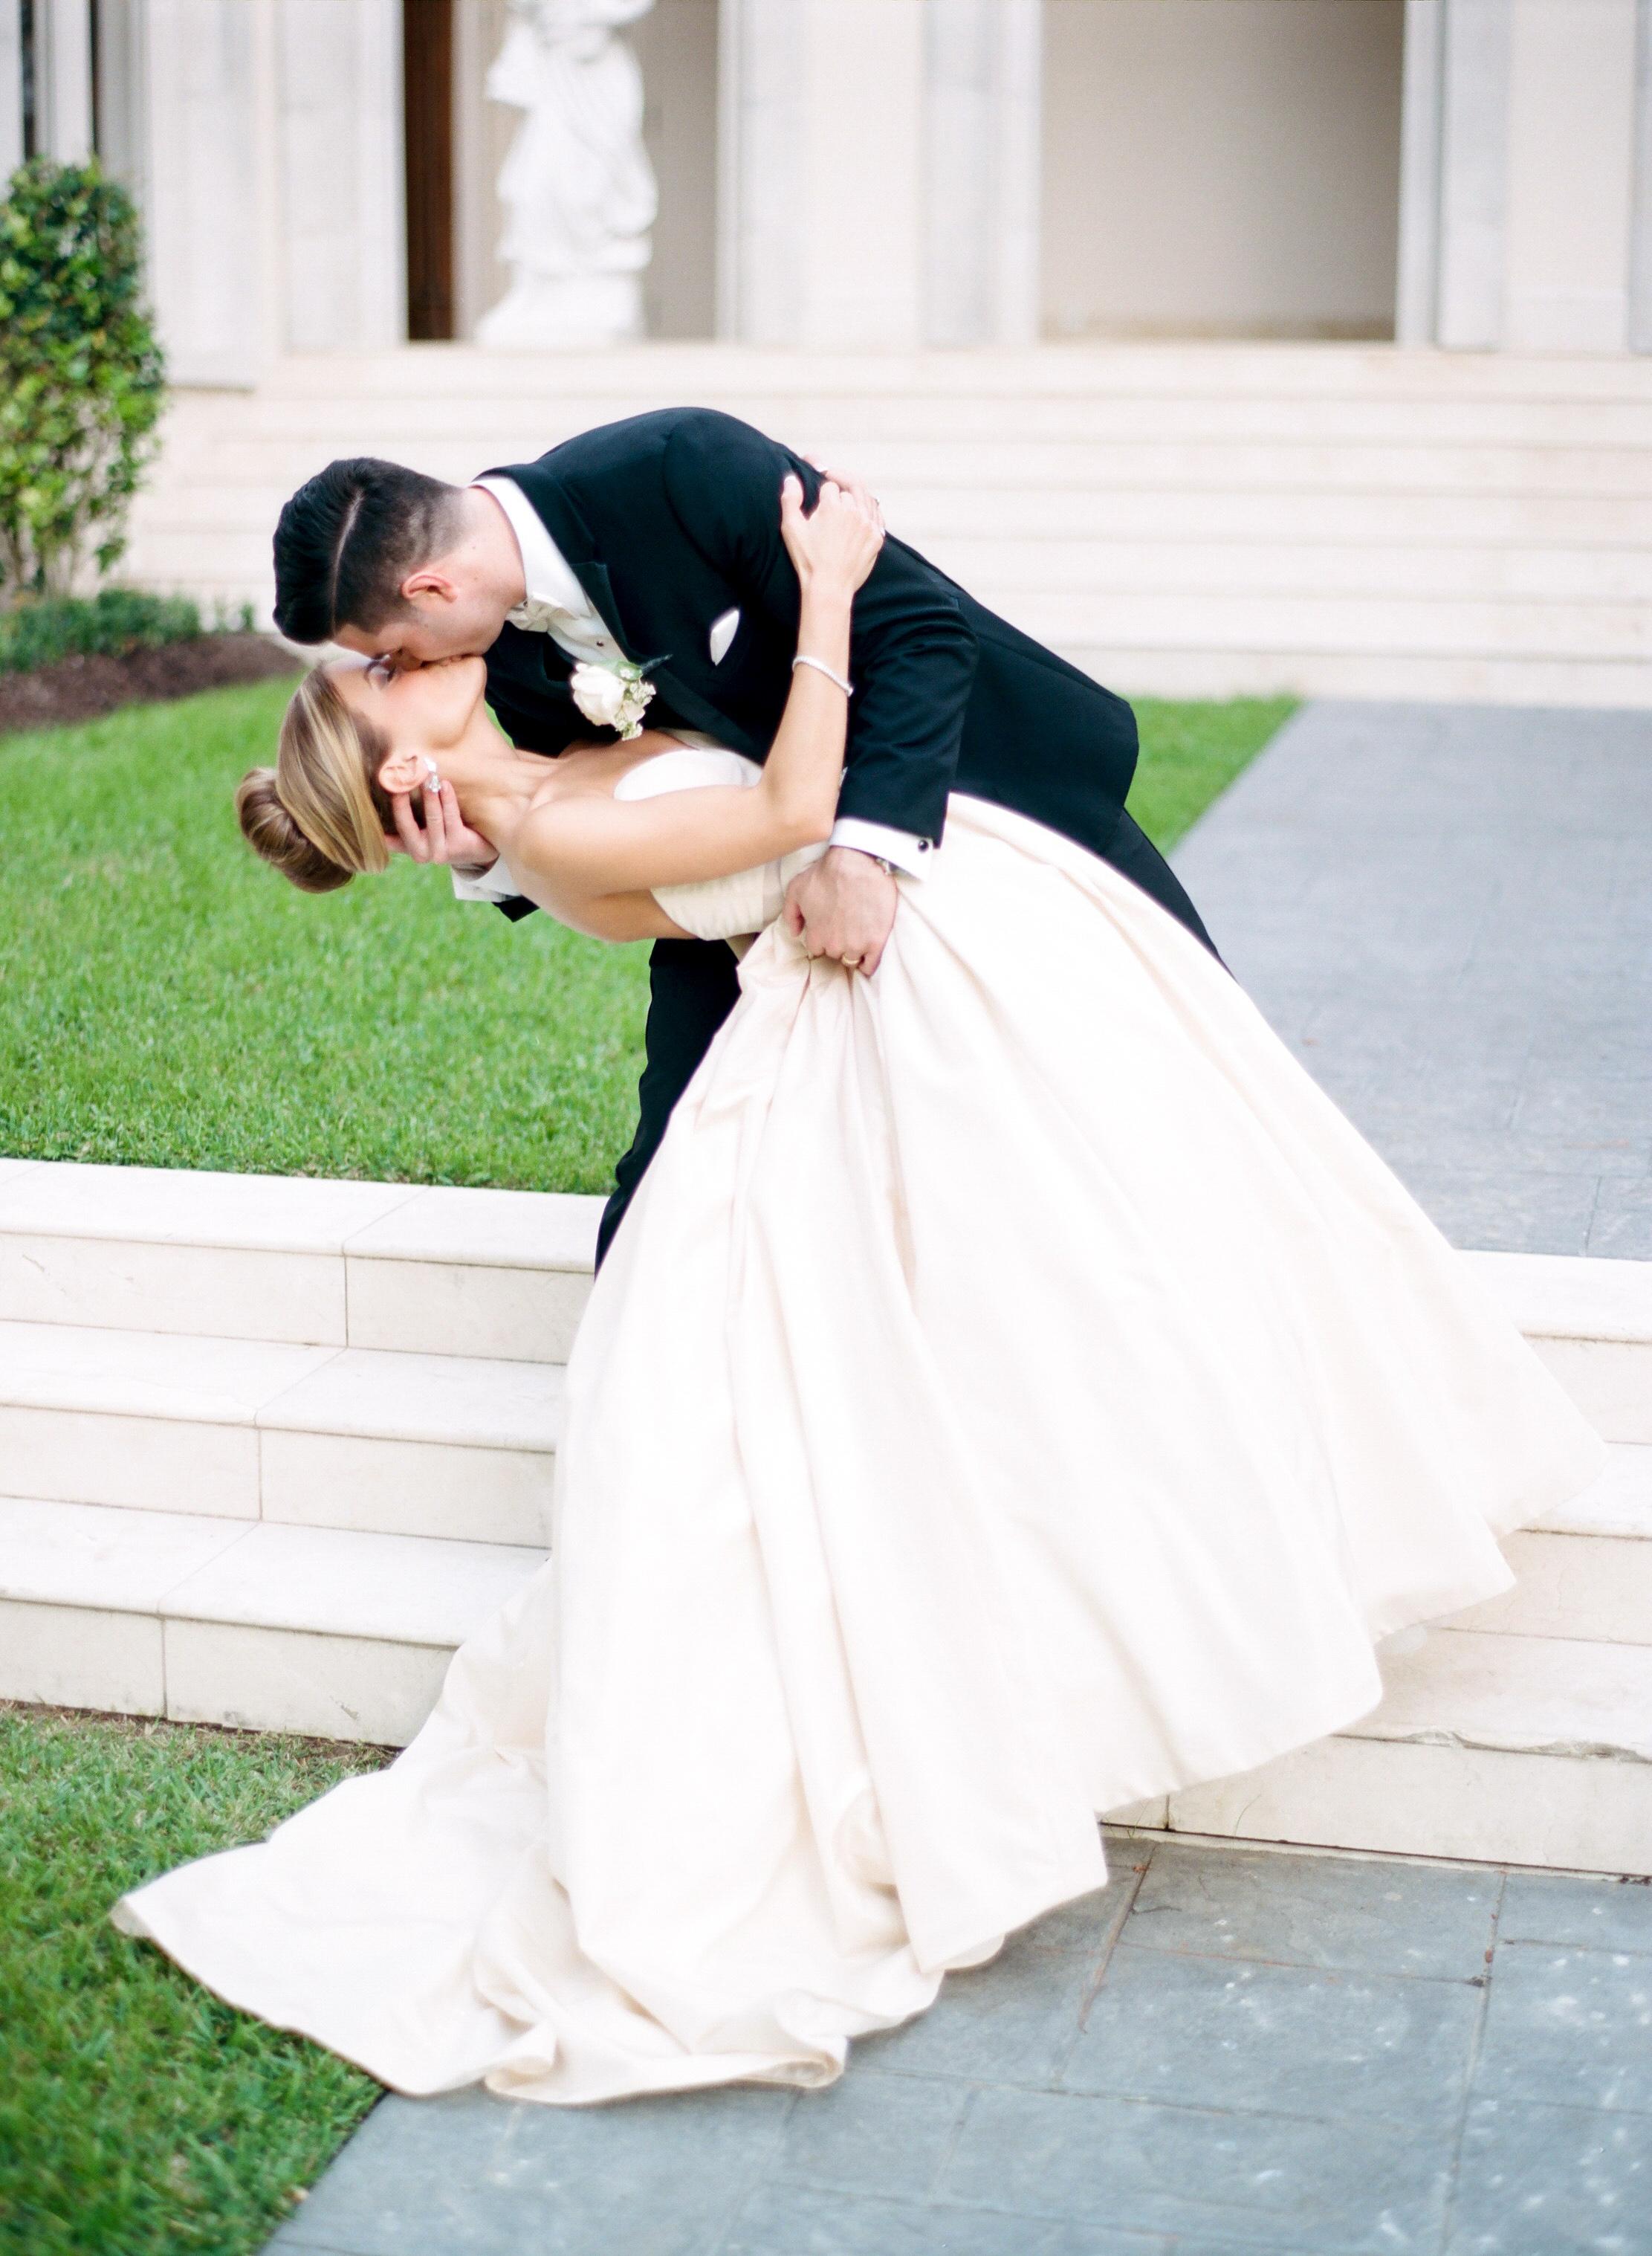 Dana-Fernandez-Photography-Houston-Wedding-Photographer-Style-Me-Pretty-Film-Texas-Destination-Photographer-38.jpg